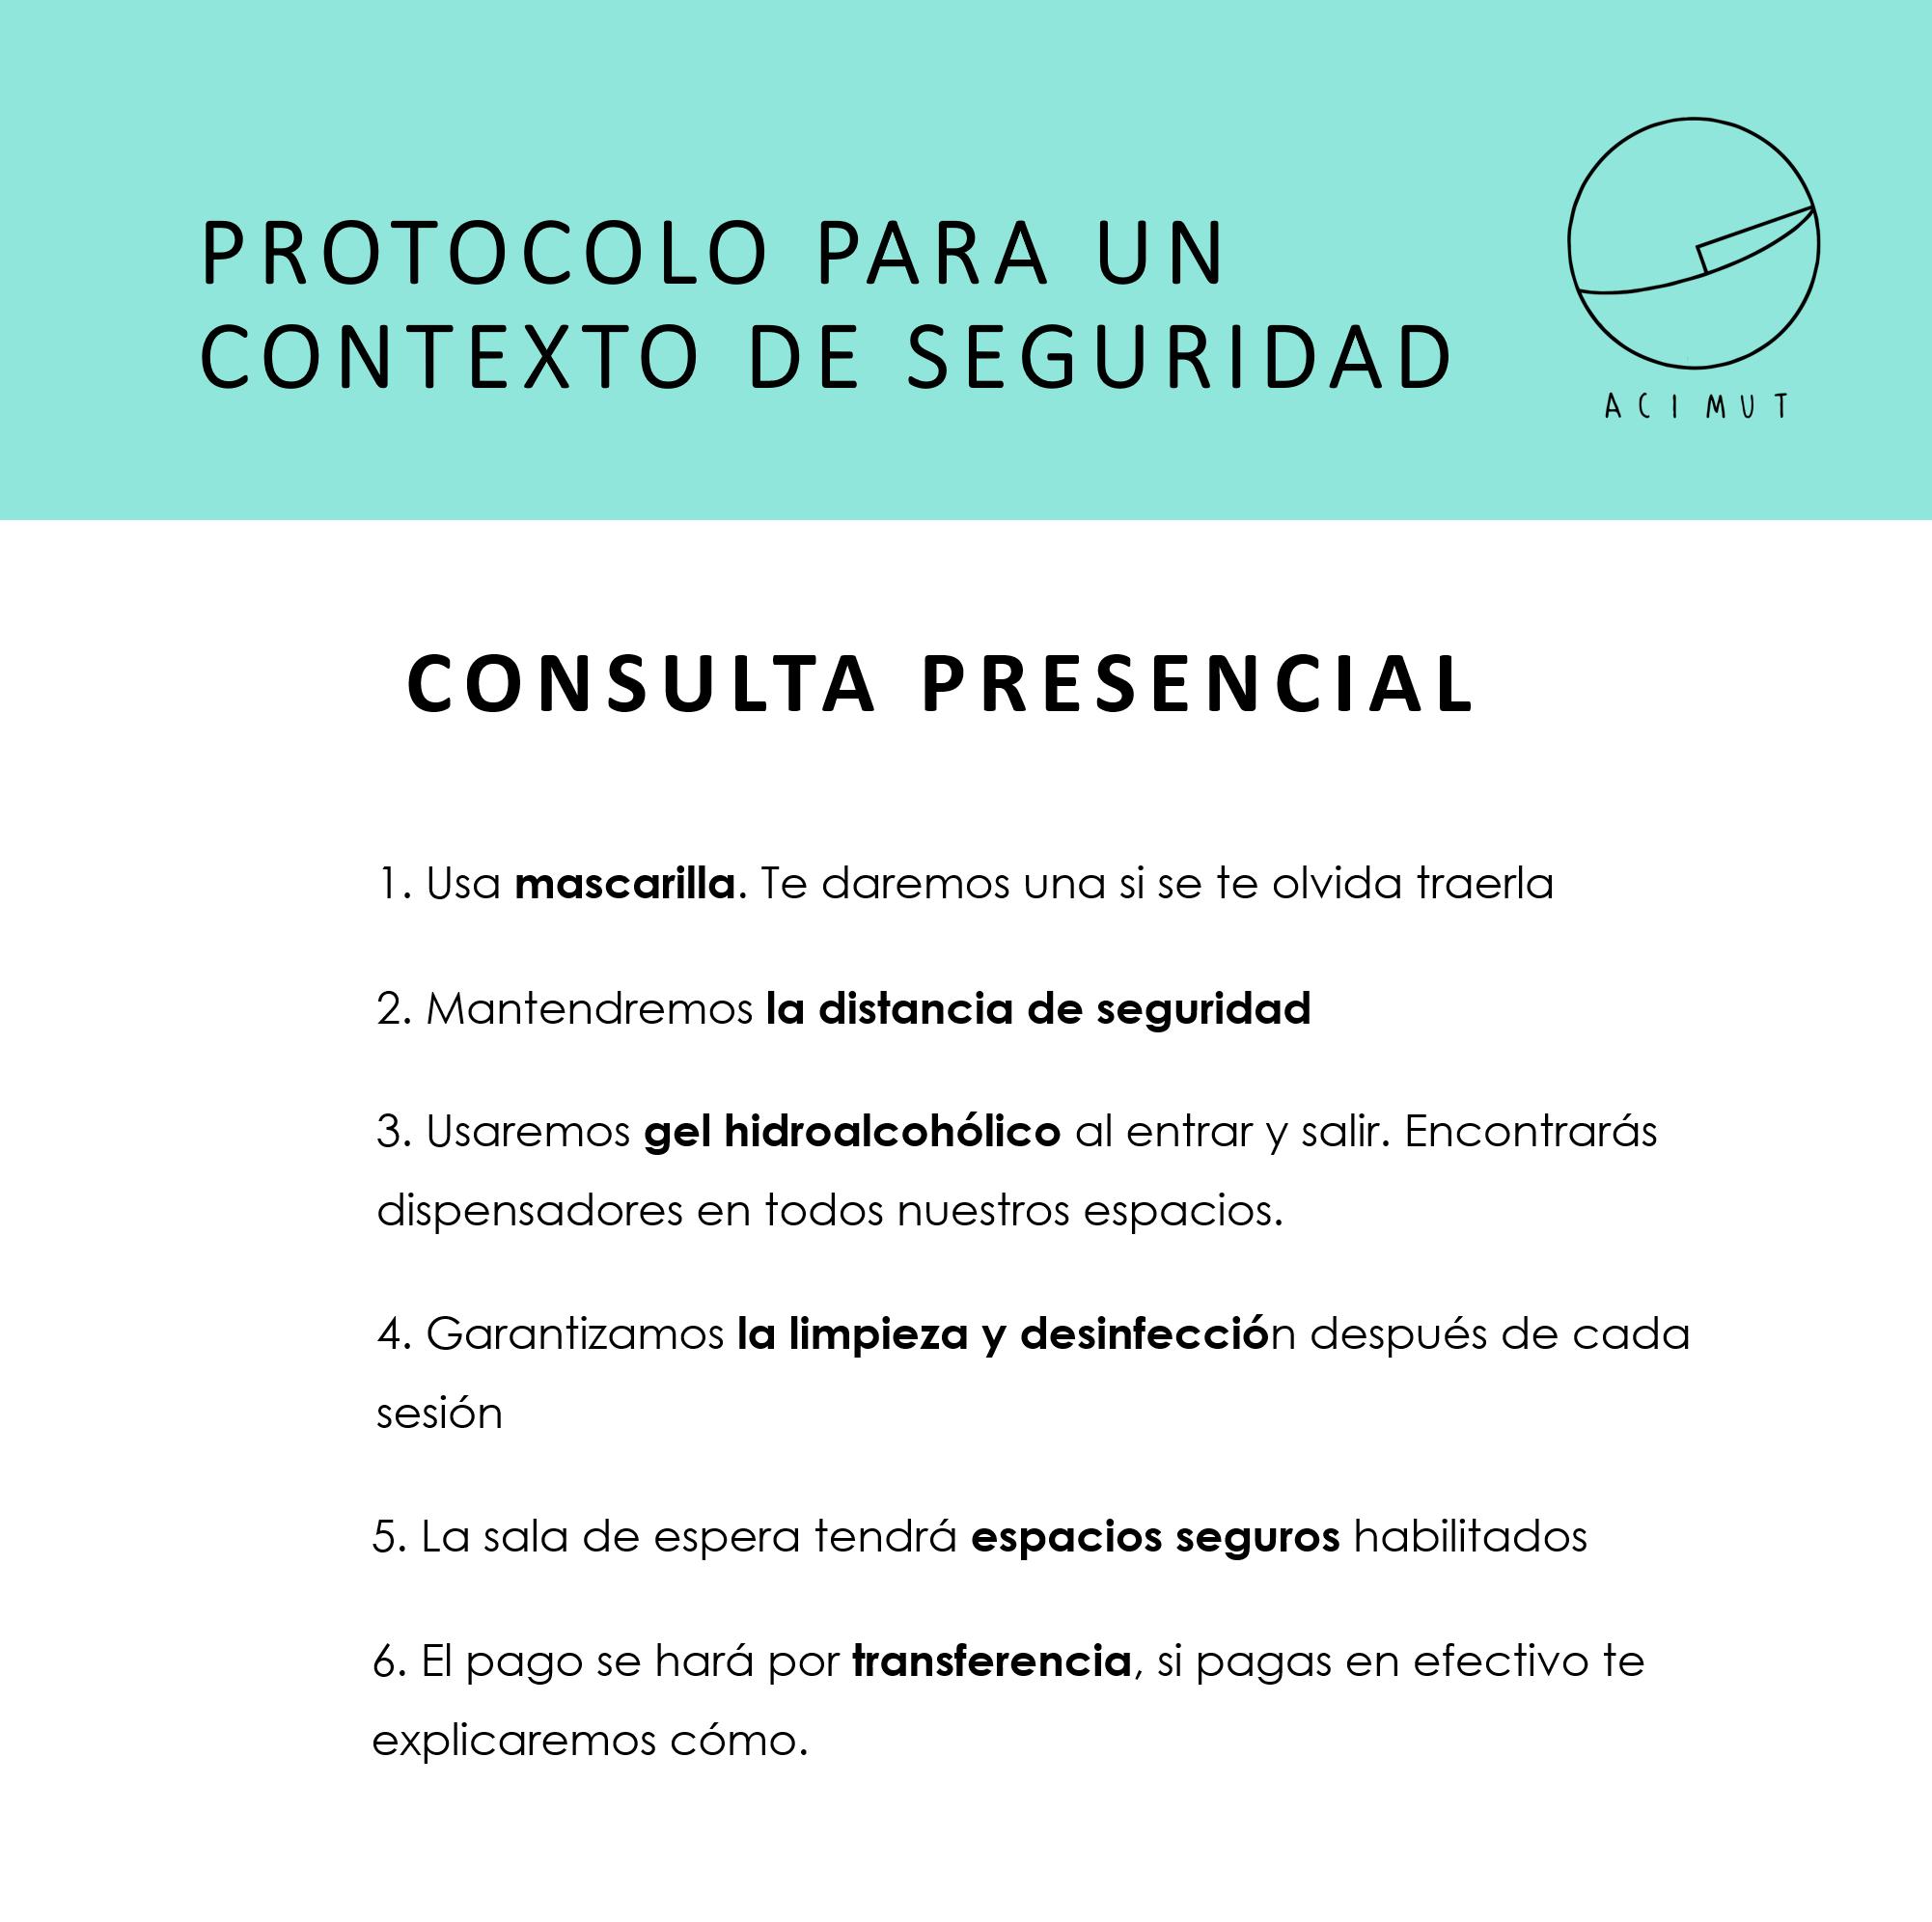 Protocolo coronavirus acimut